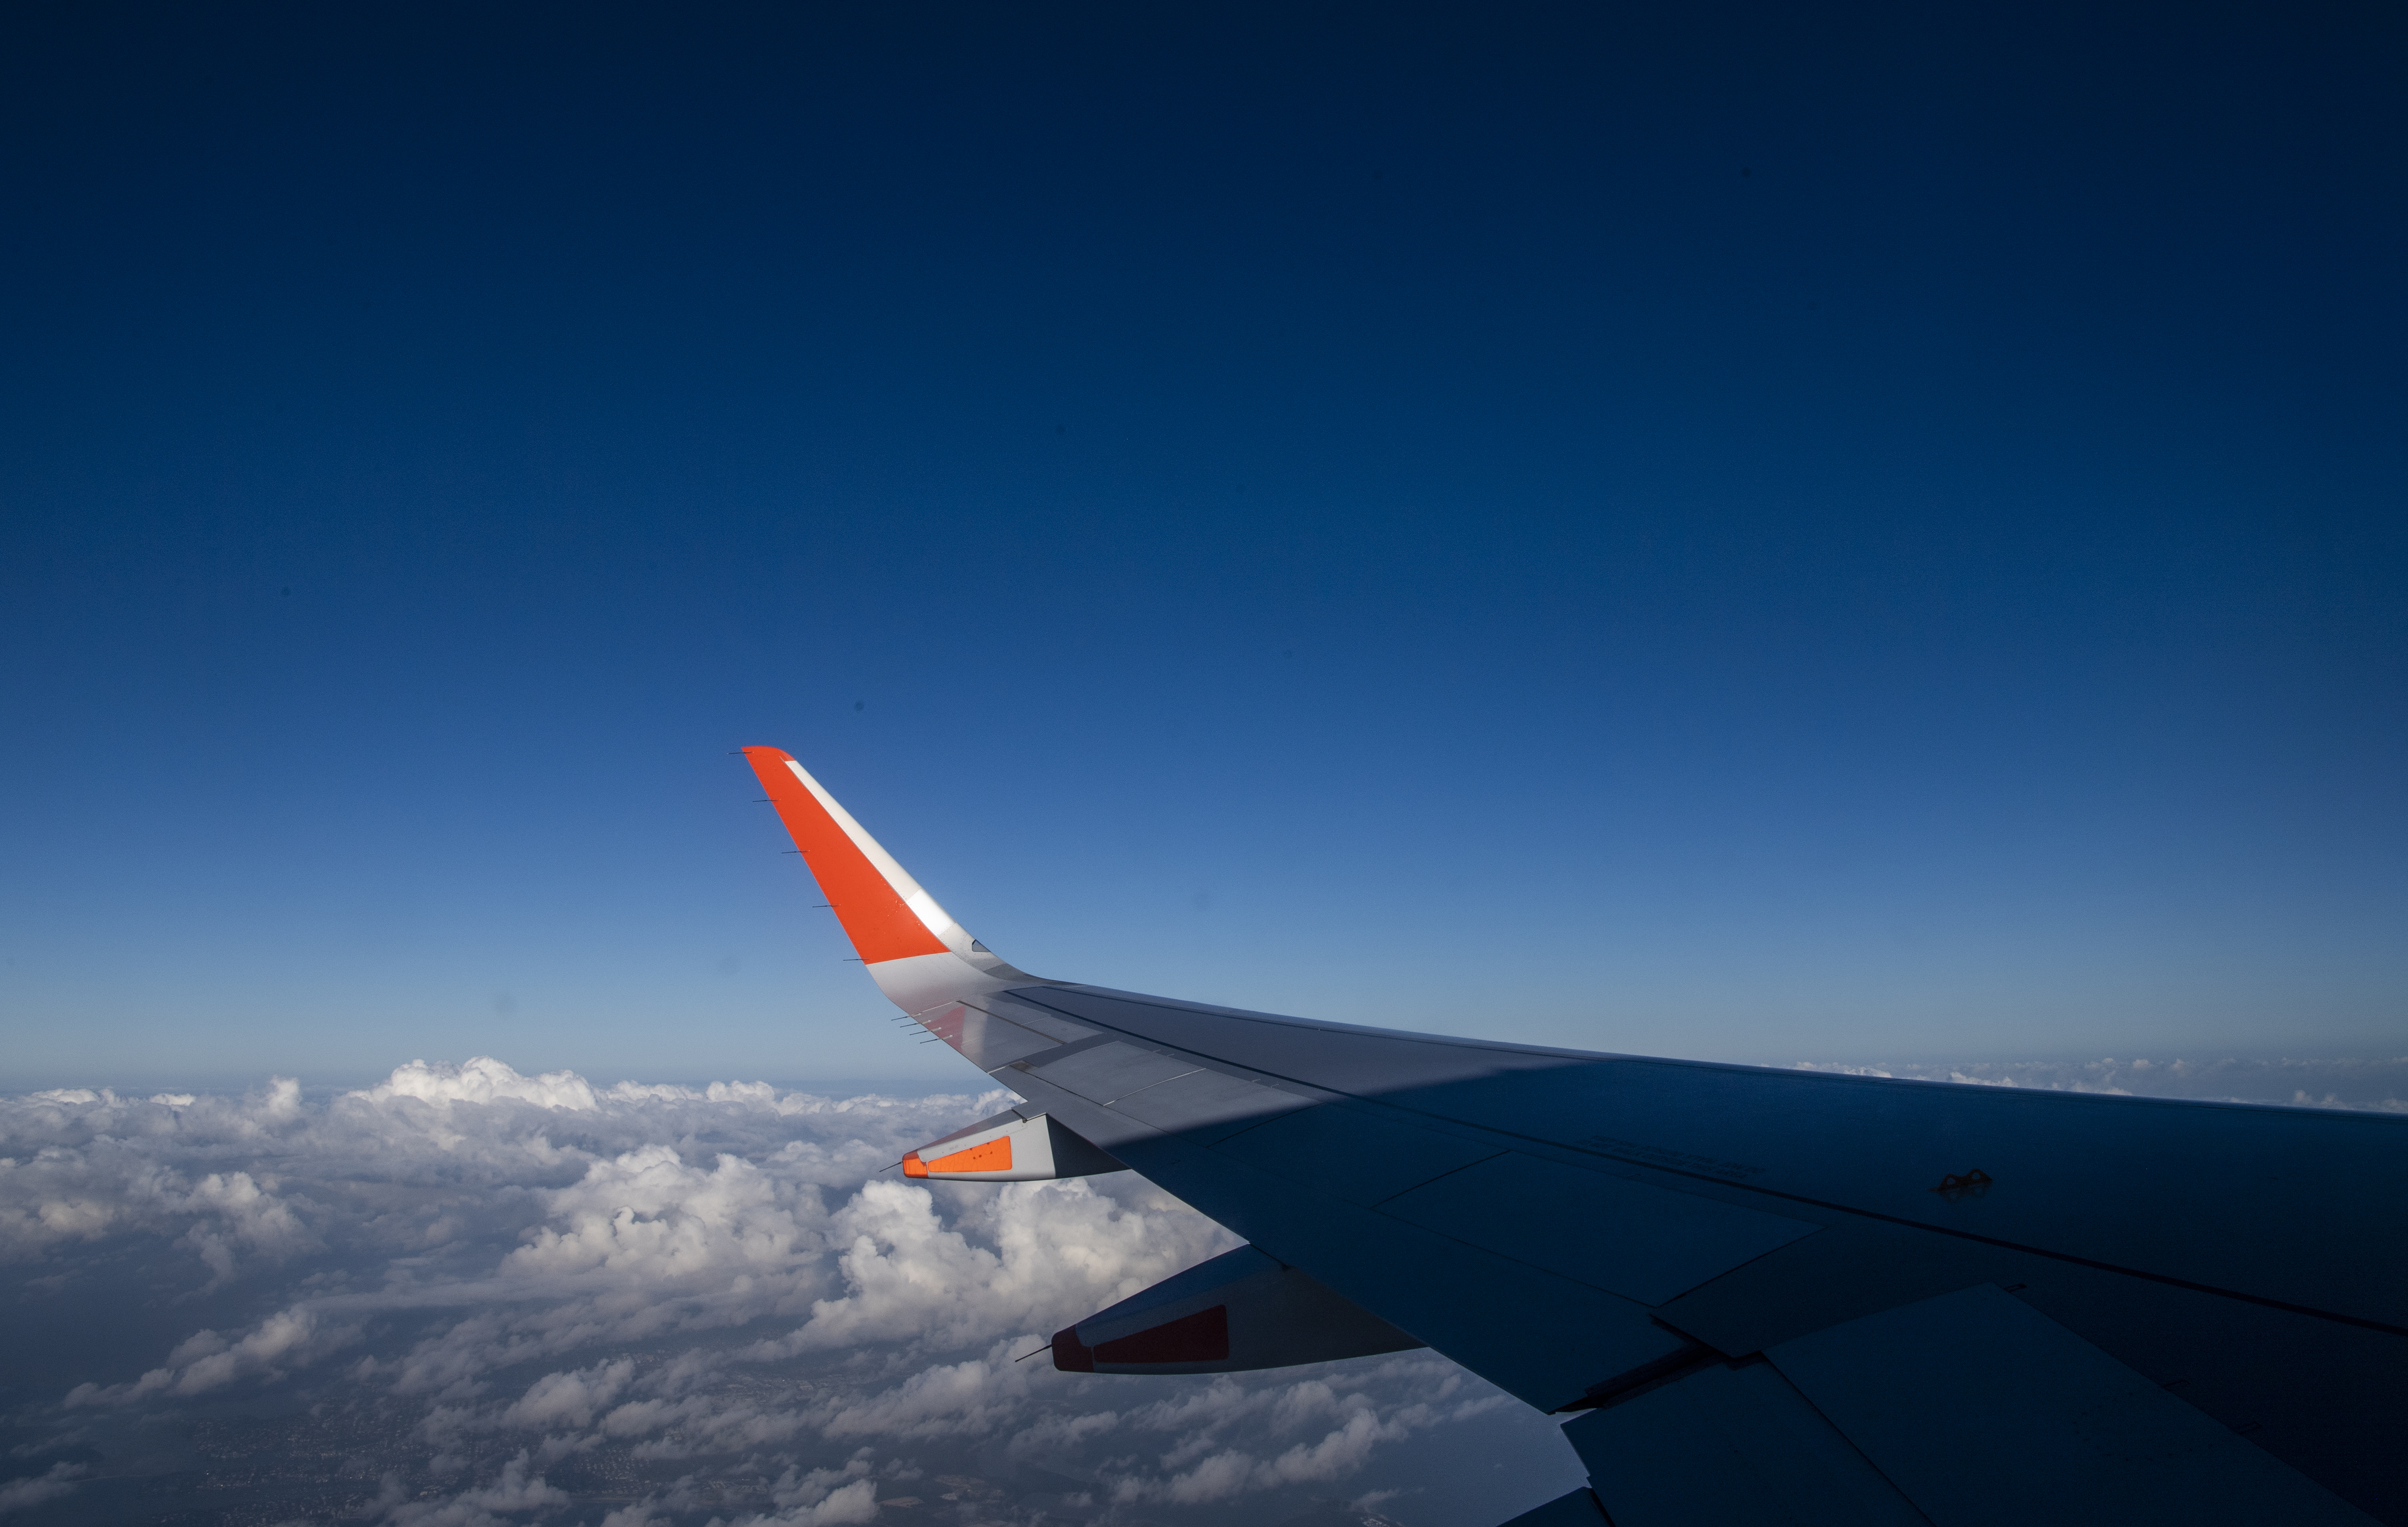 Jetstar launches $20 flight sale between NSW and Victoria